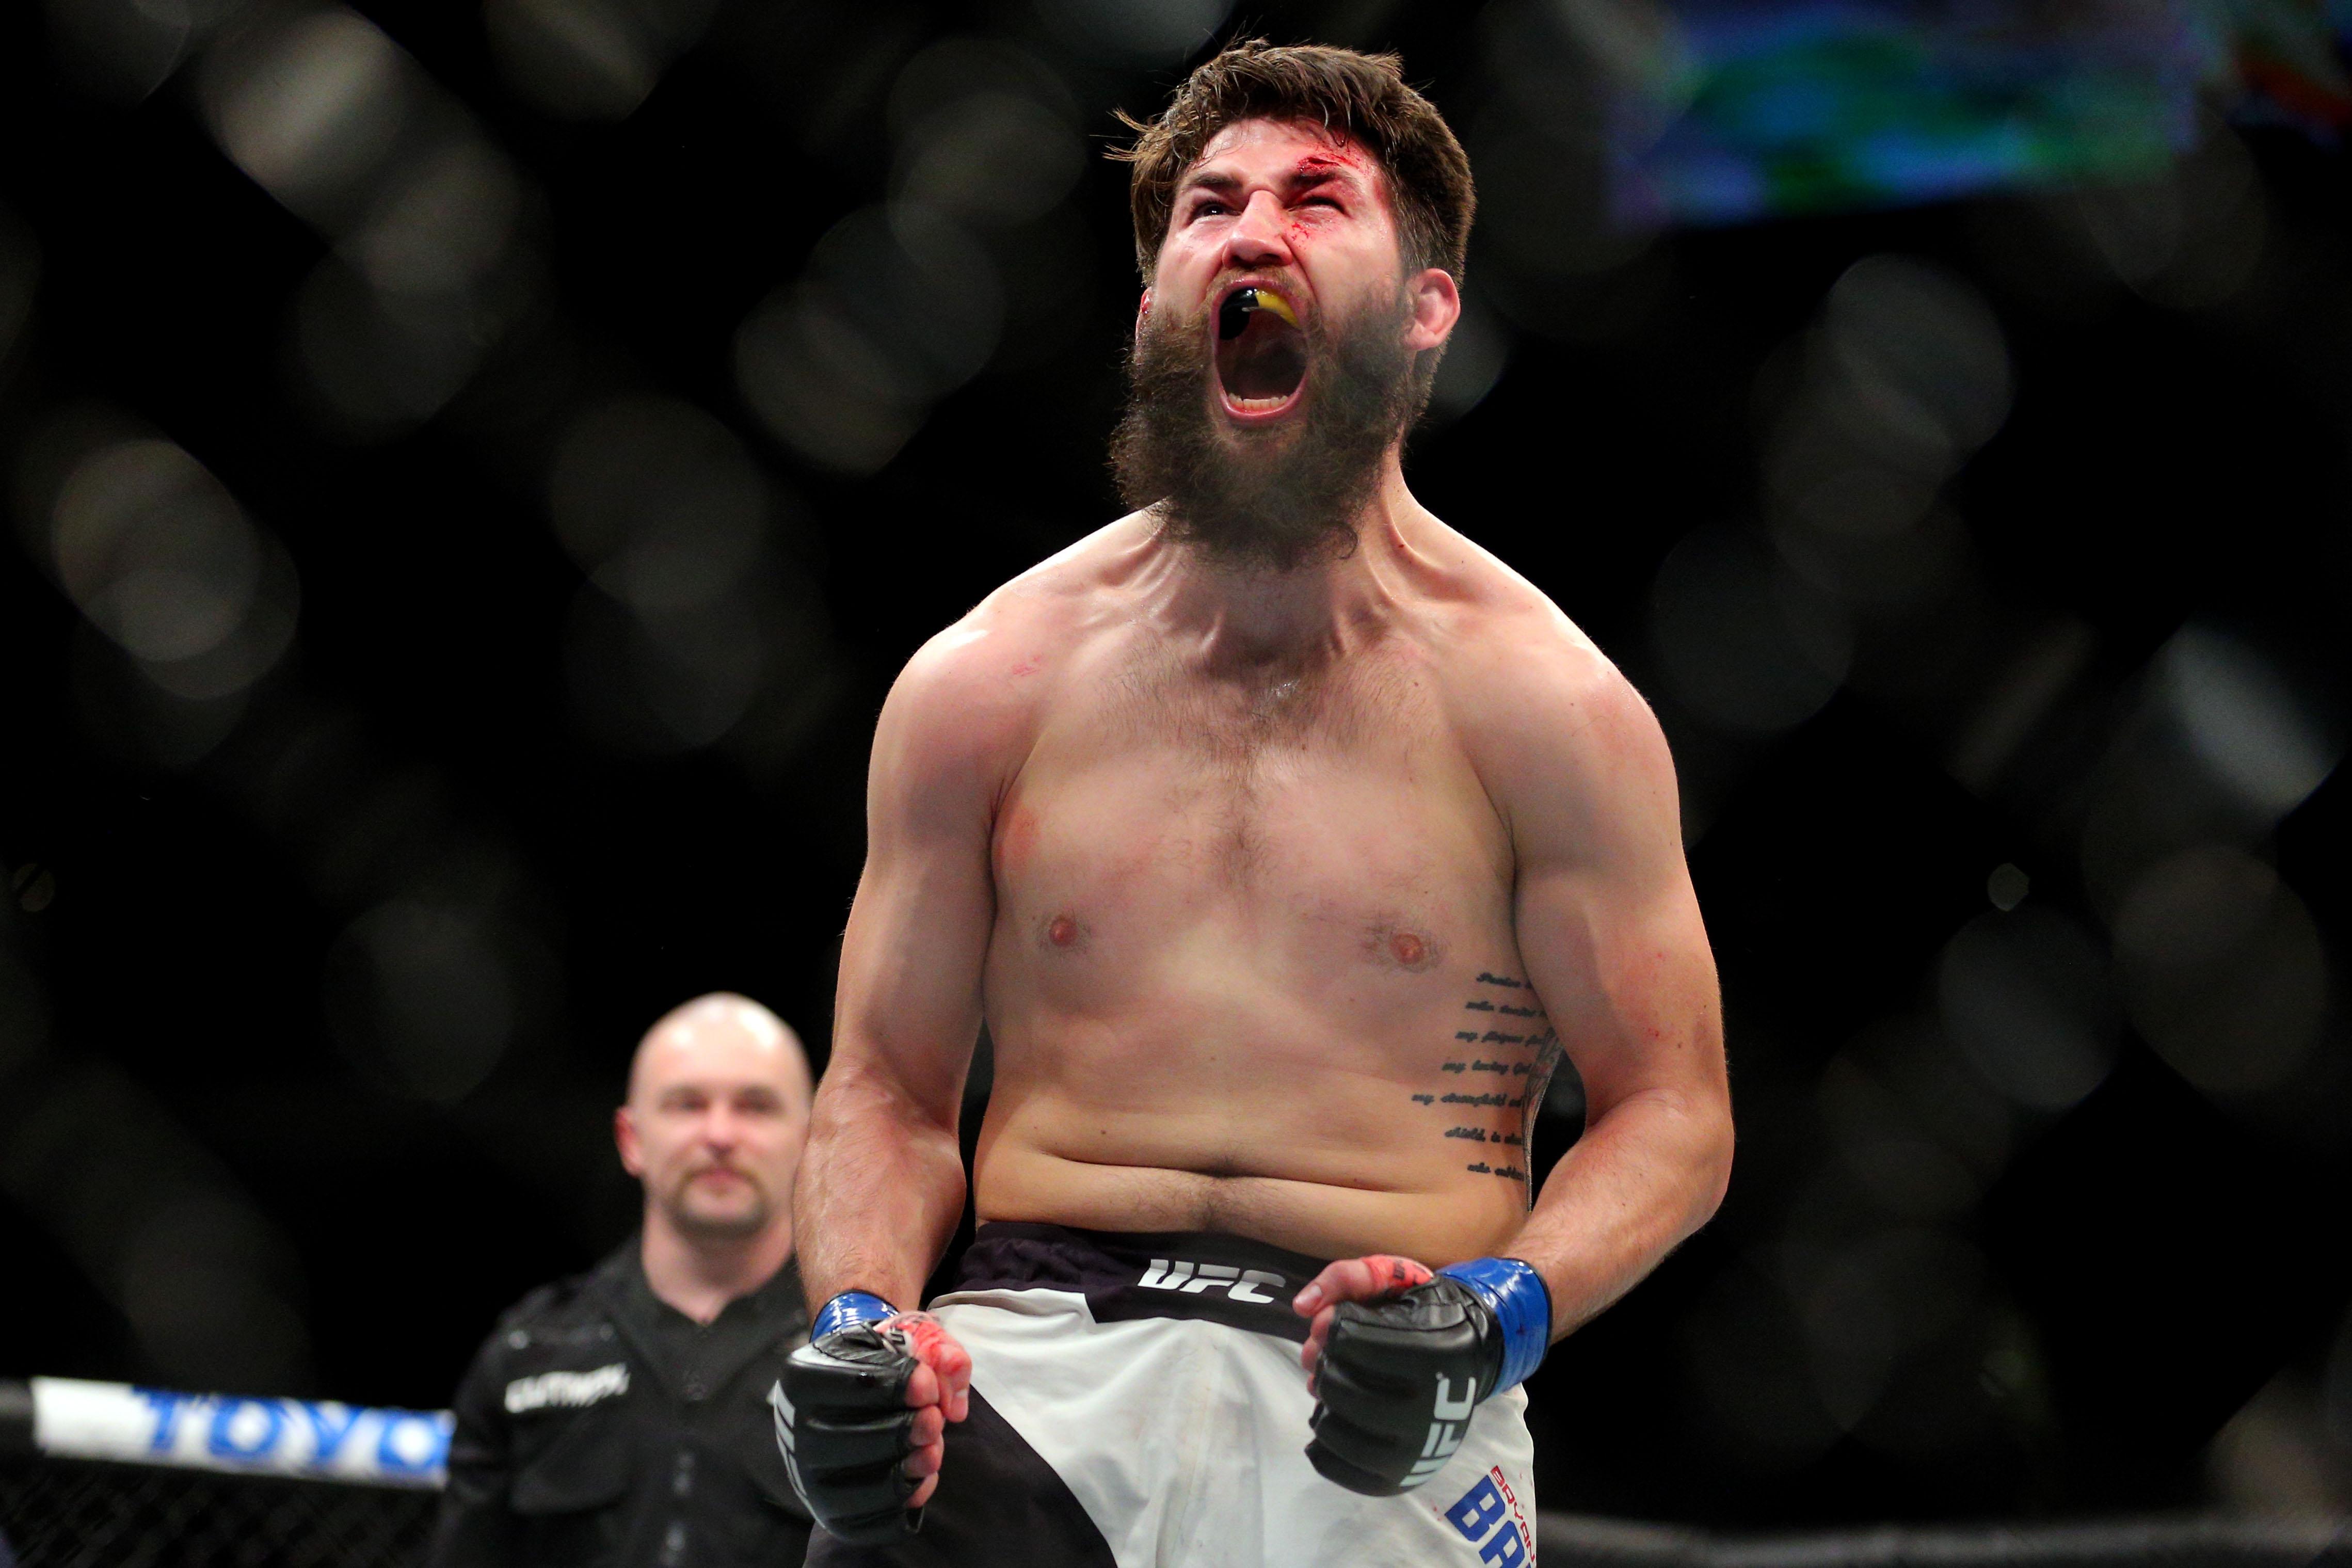 MMA: UFC on Fox 18-Northcutt vs Barberena